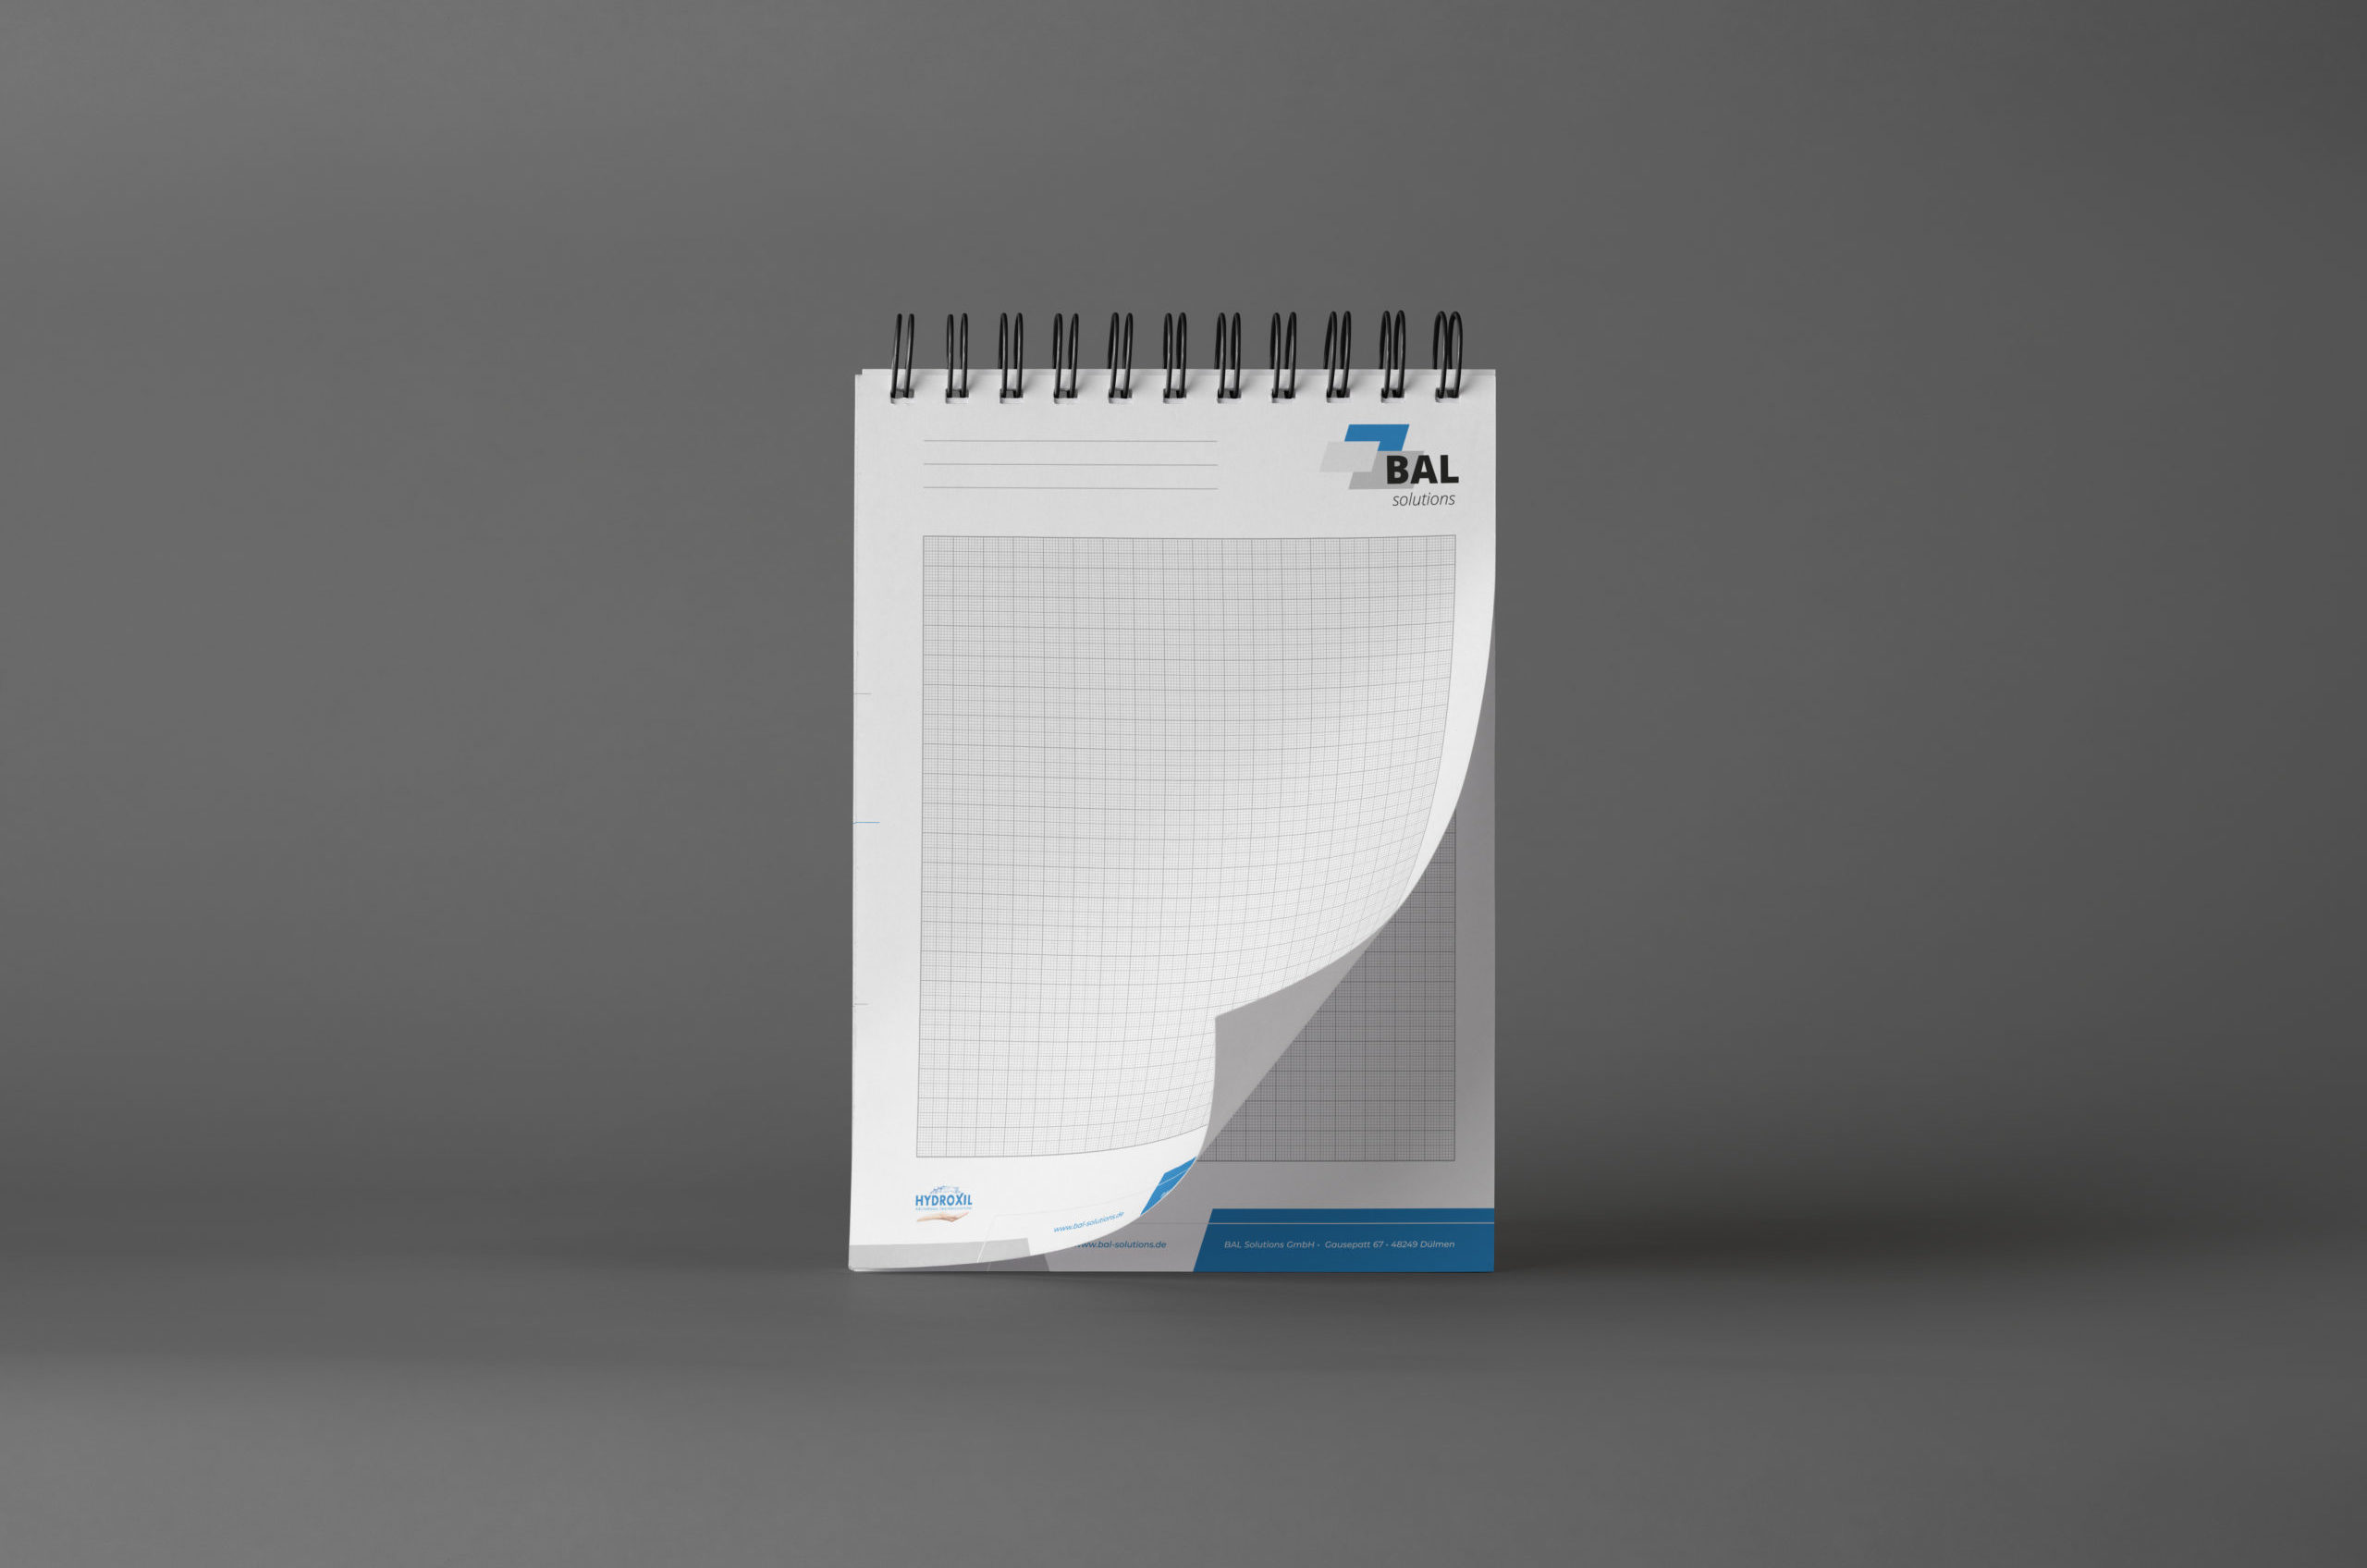 Corporate Design Block BAL solutions